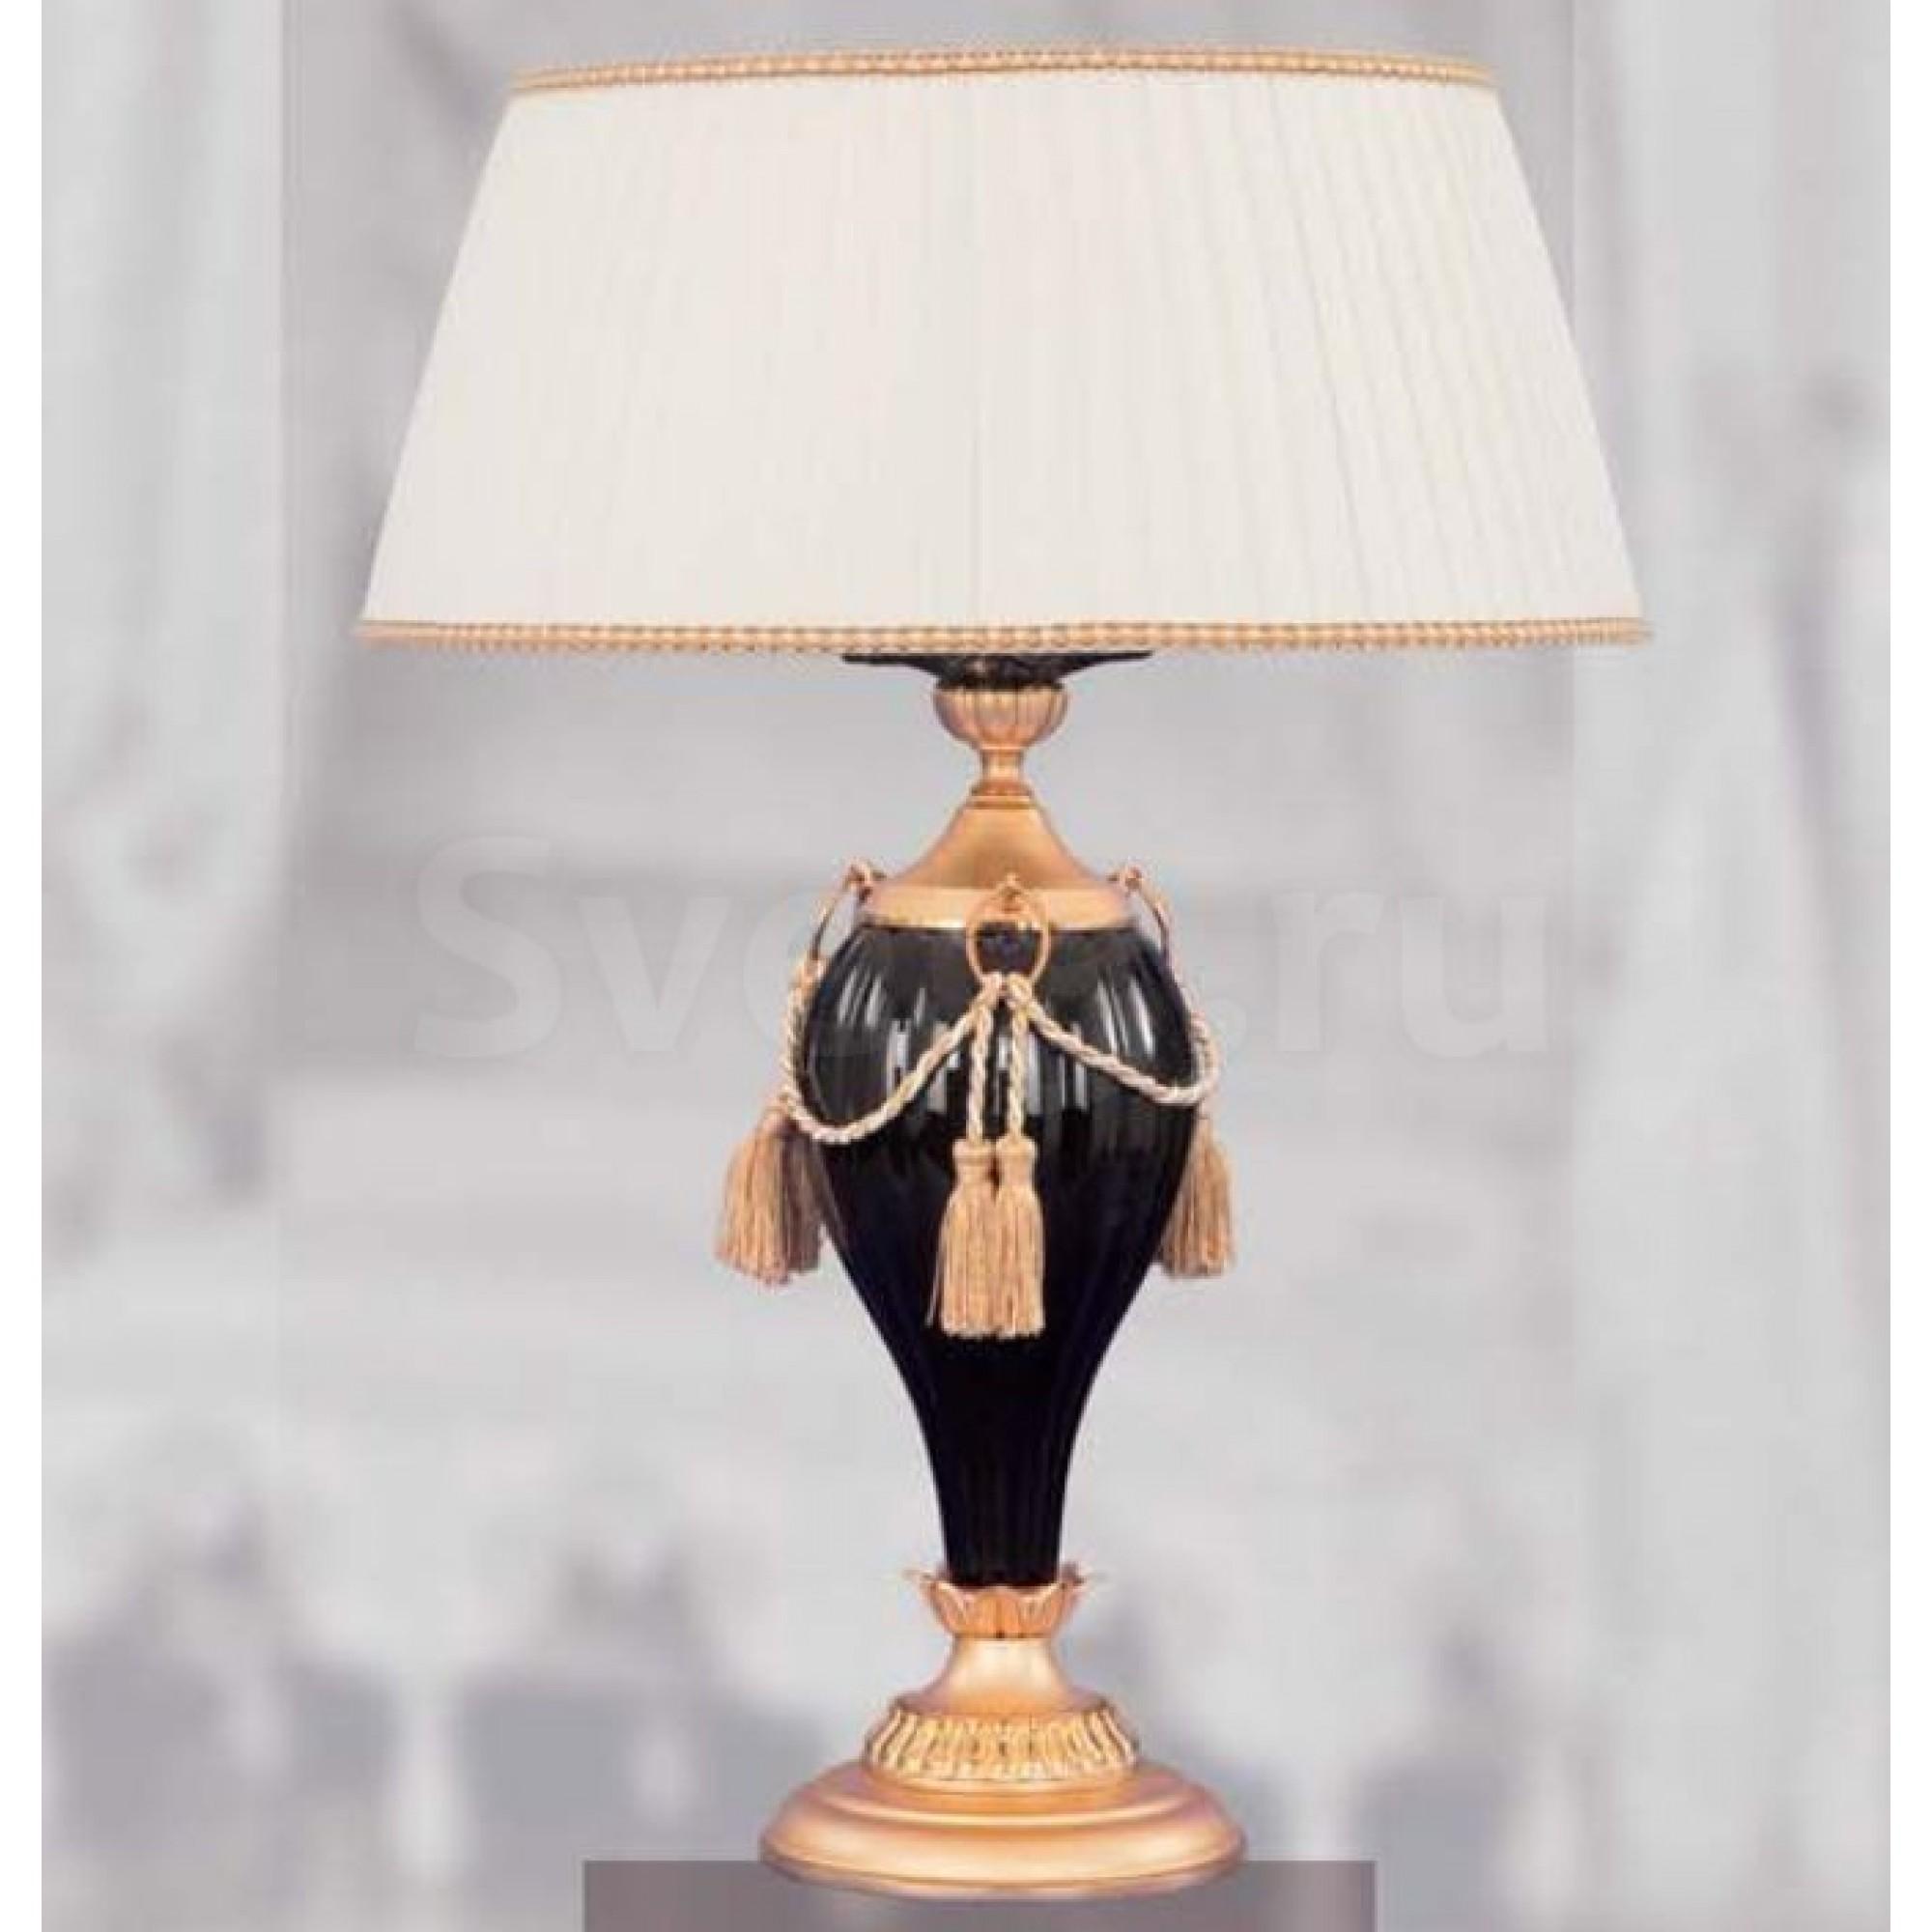 MASA LAMBASI 1L Q:40cm H:56cm EA BLACK - Klasik -  RIPERLAMP